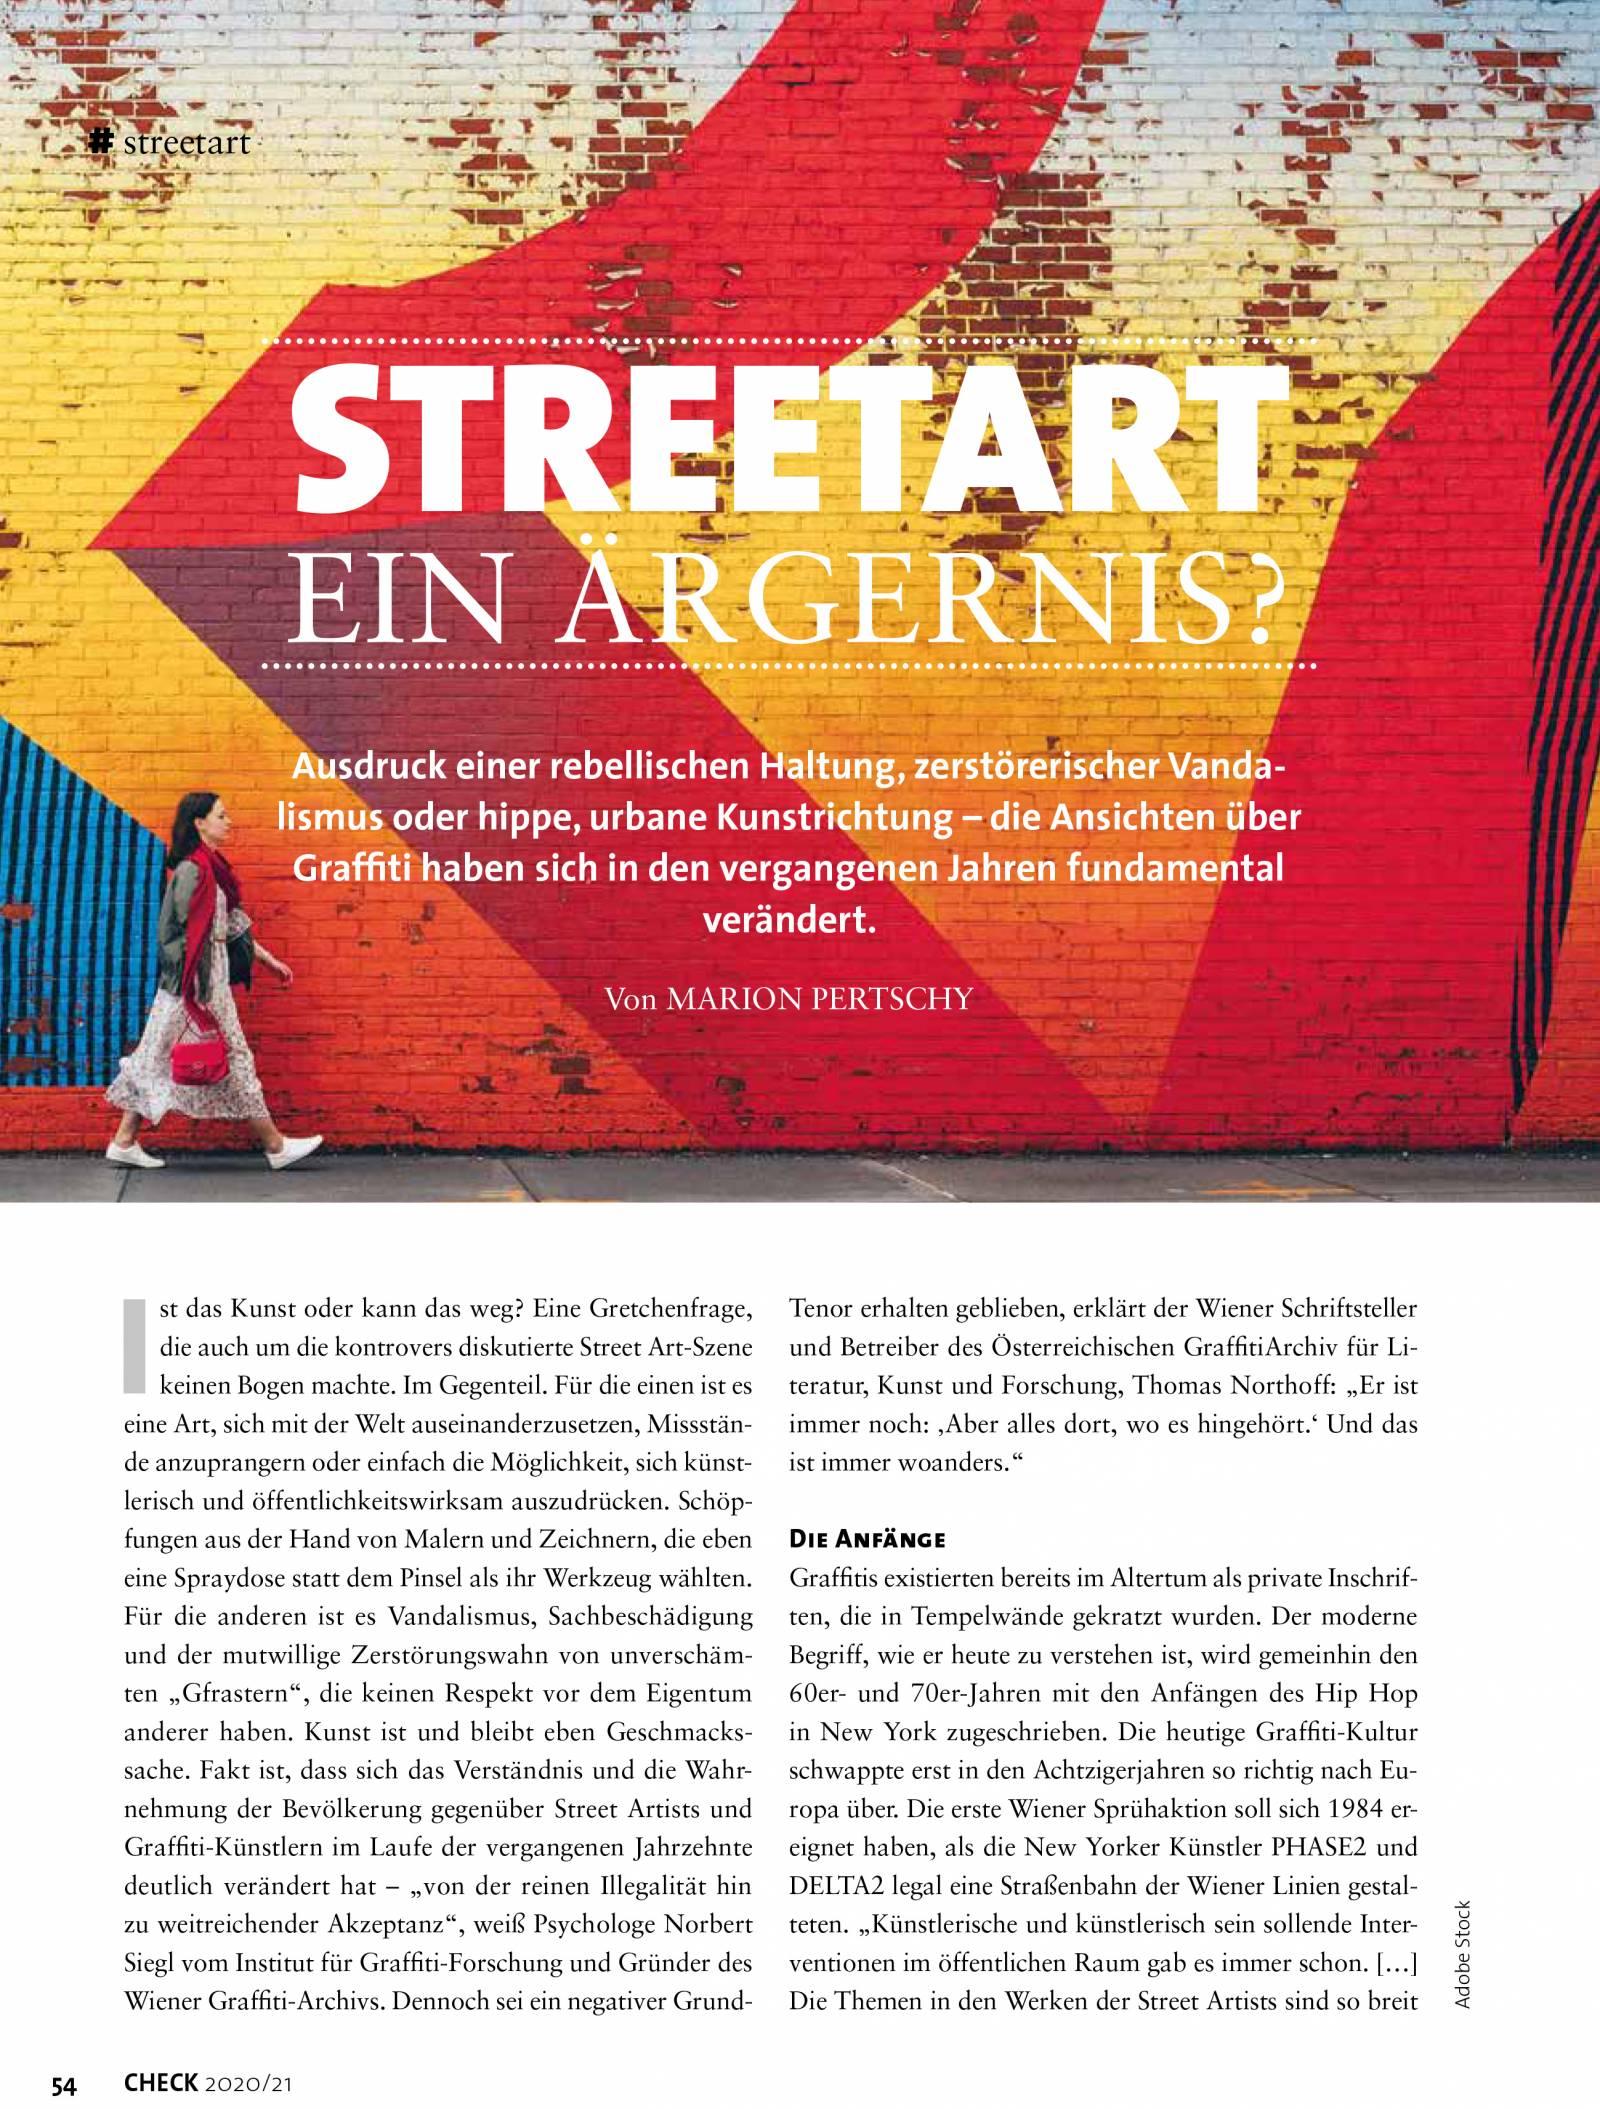 s-1-20-streetart-5s-pertschy-gk-1